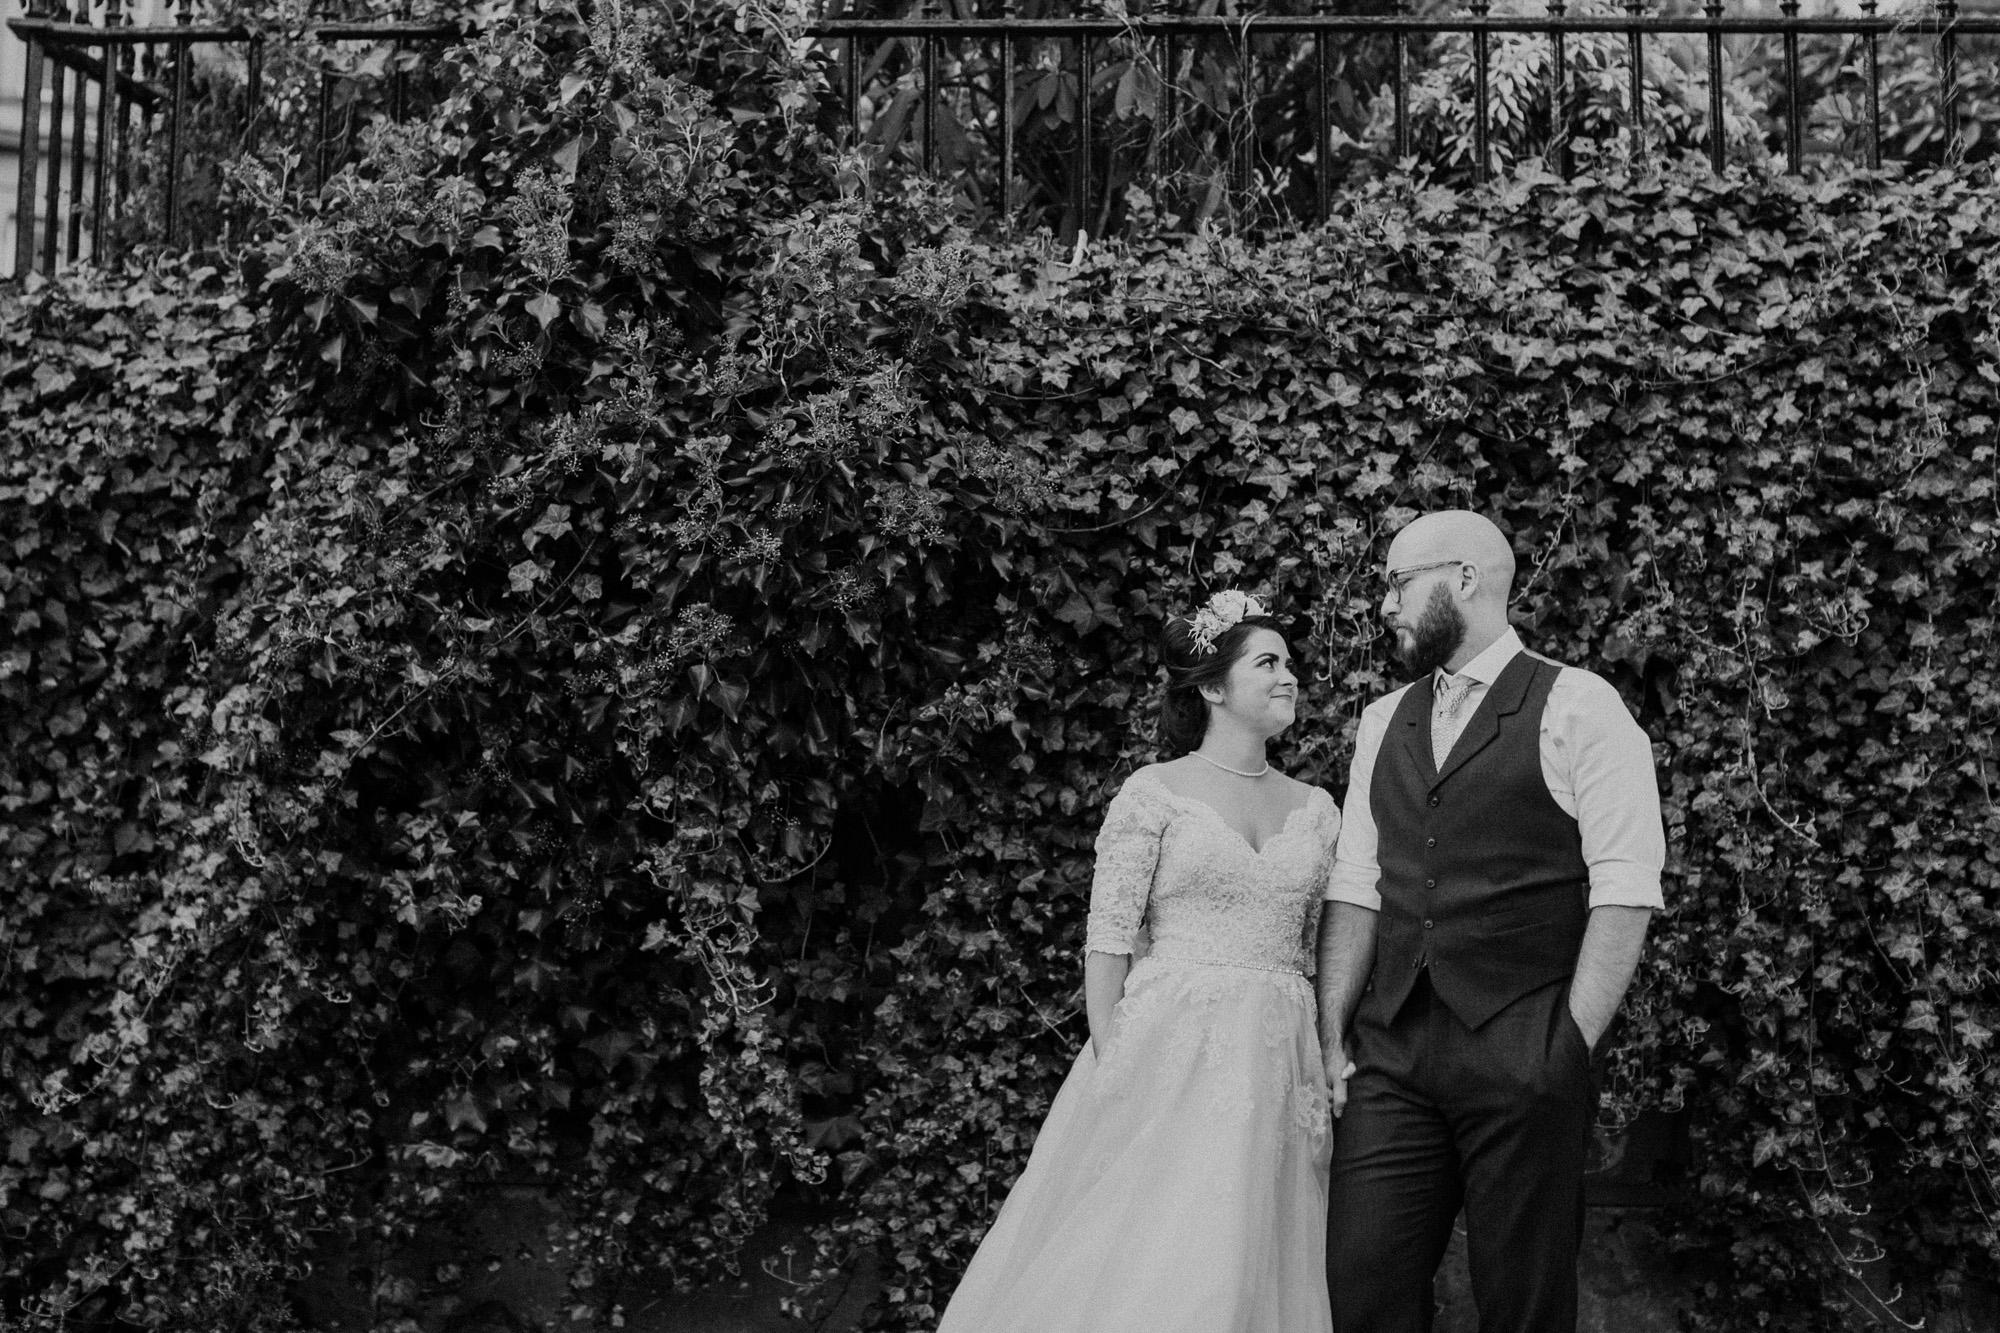 Quirky Wedding Photography Glasgow West End 057.jpg